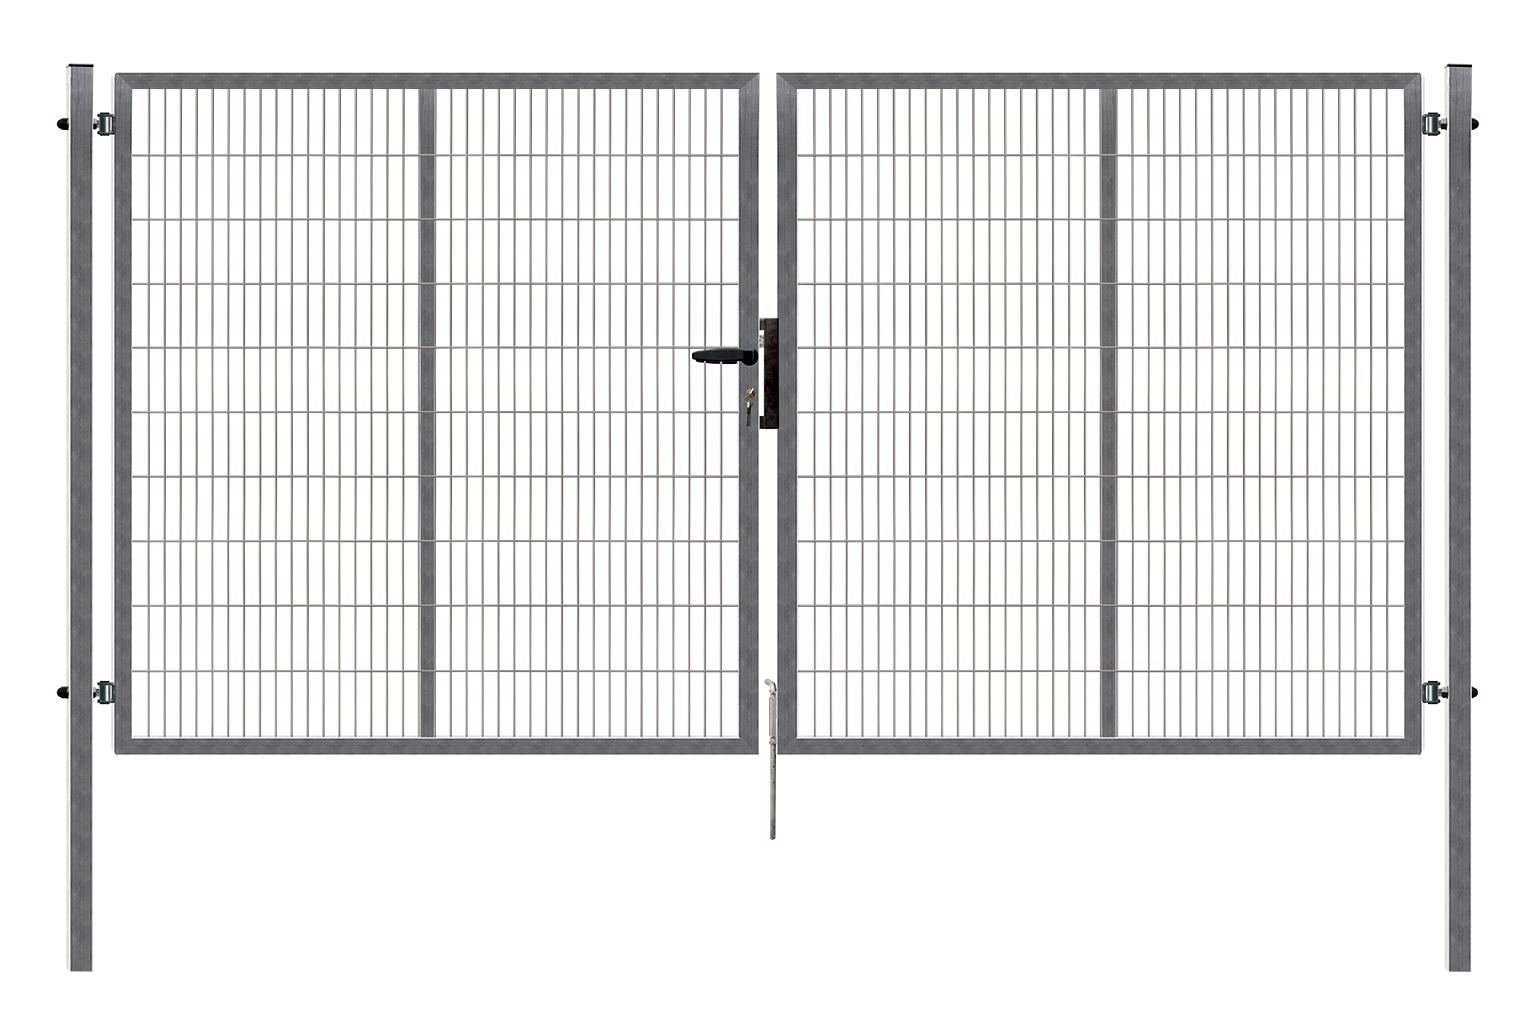 Brána PILOFOR SUPER dvoukřídlá, 4110x1780 mm, Zn 79,5Kg